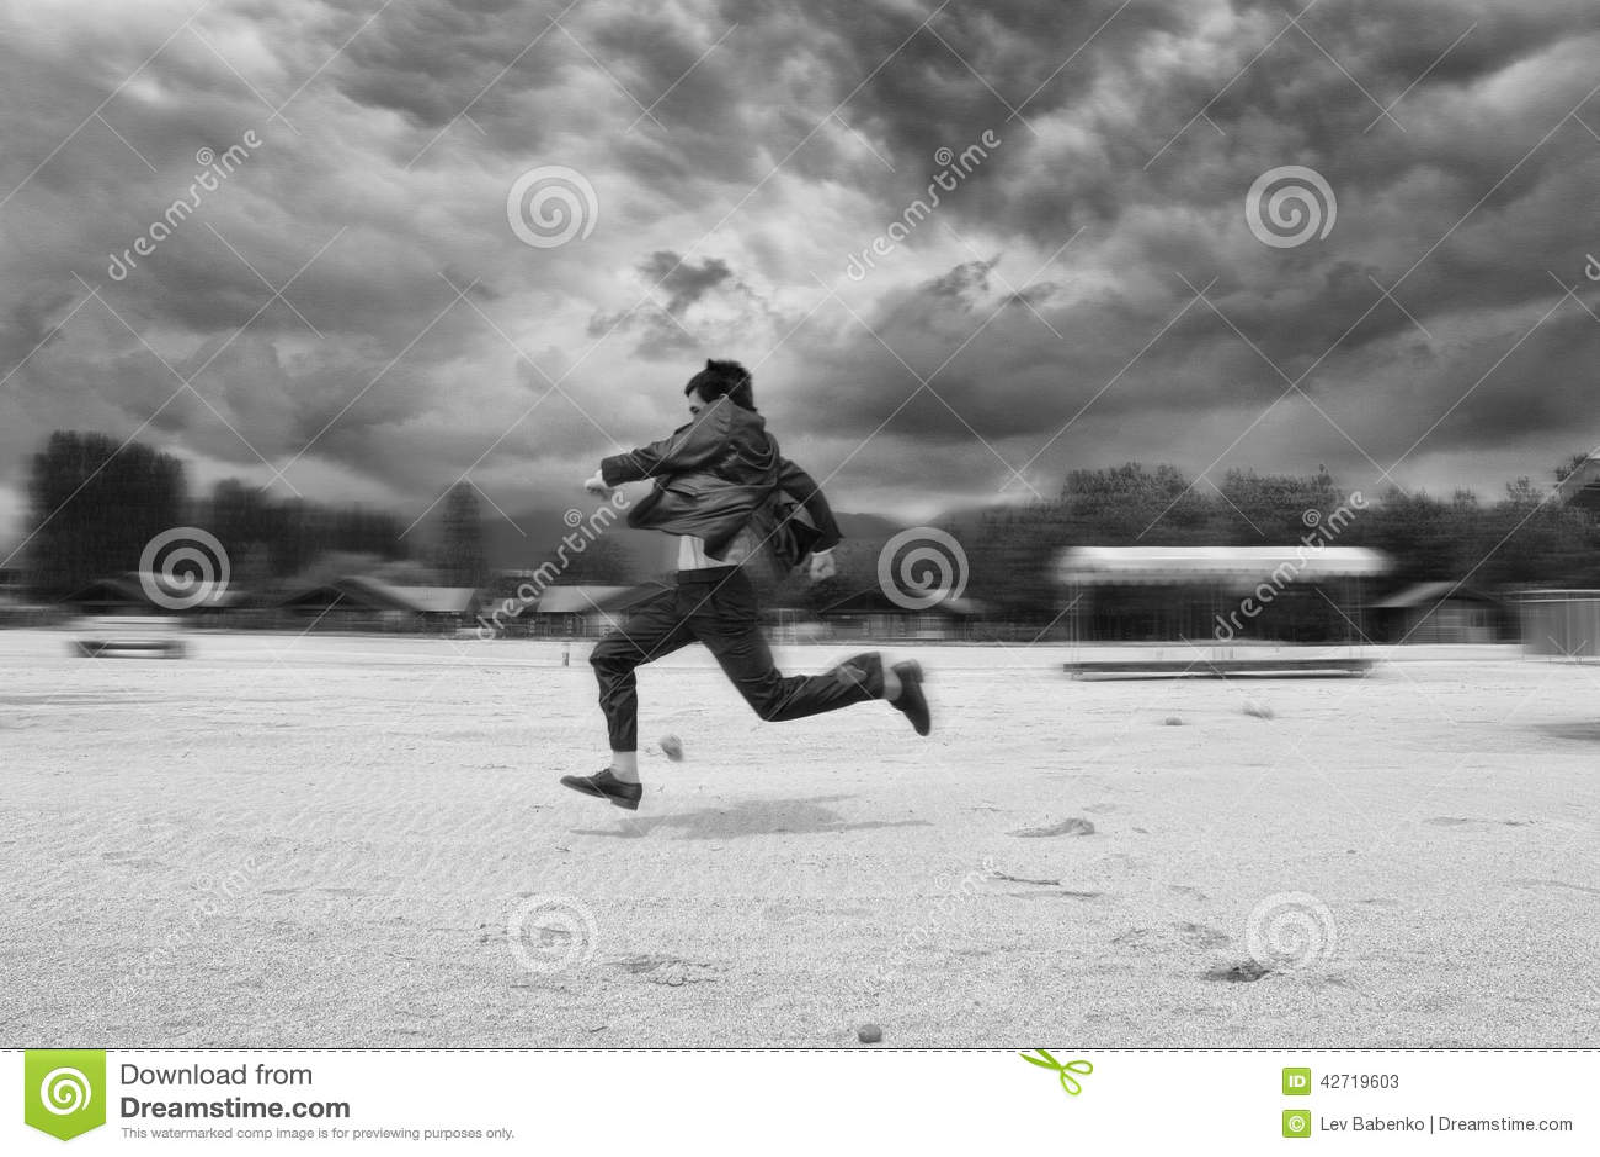 Runing在海滩的商人 背景迷离弄脏了抓住飞碟跳的行动